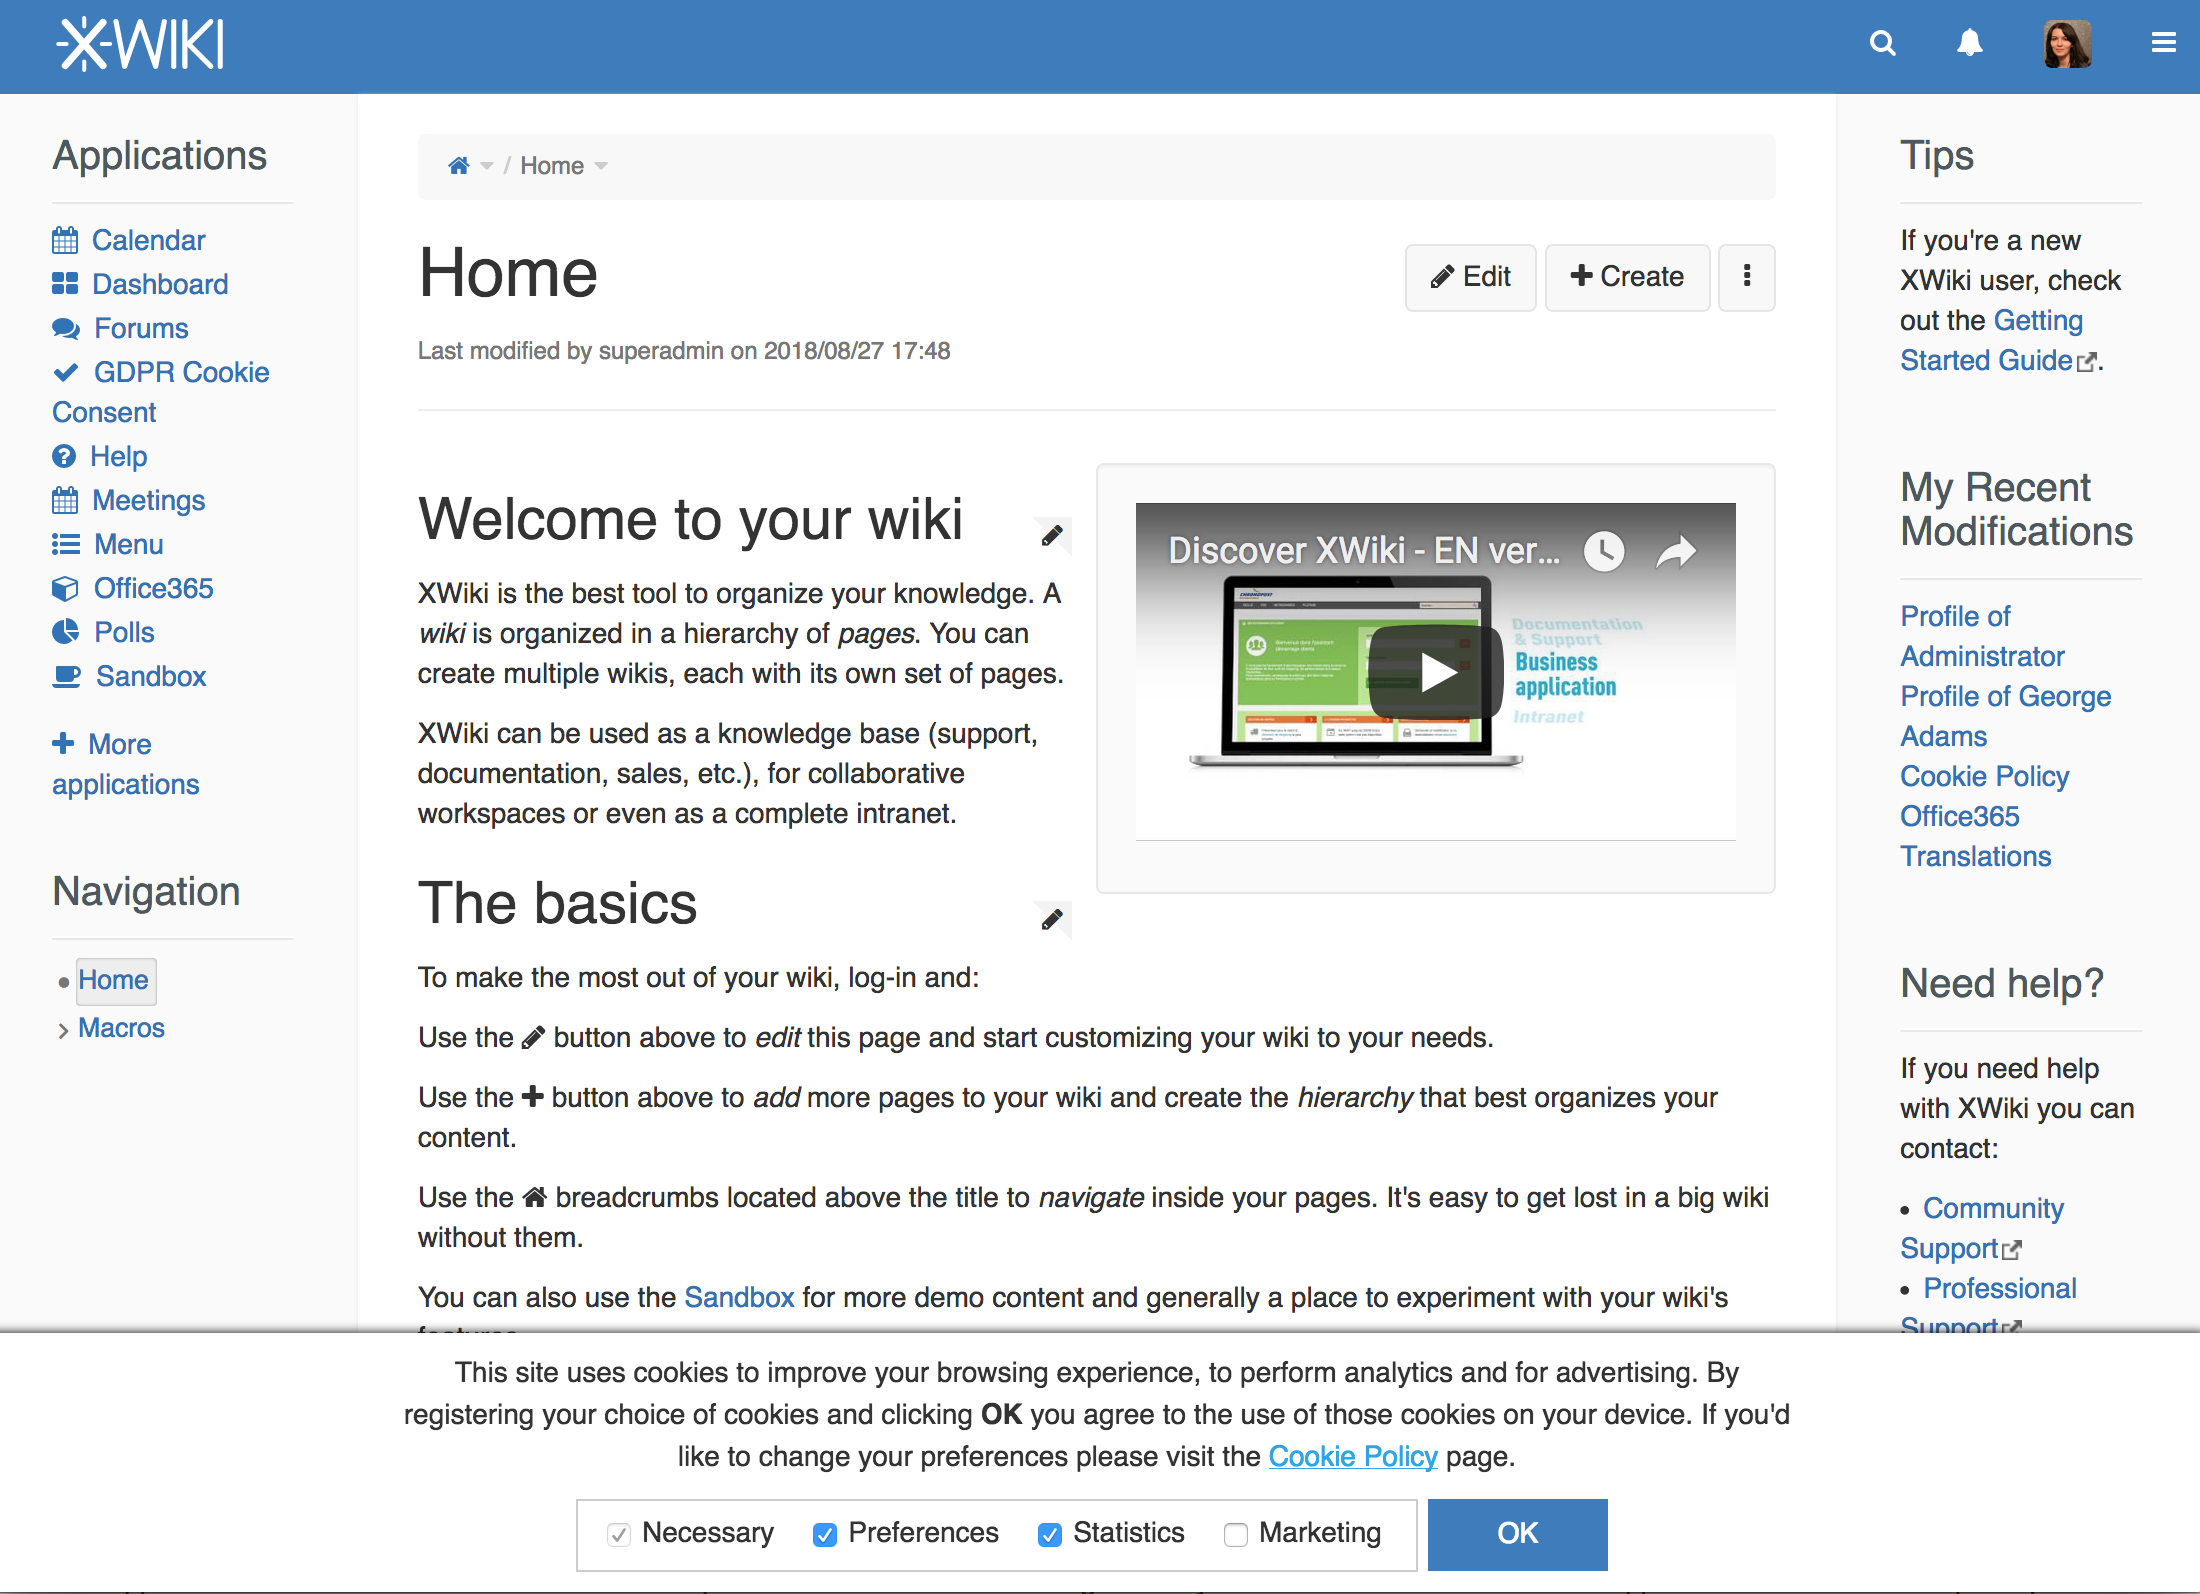 https://store.xwiki.com/xwiki/bin/download/Extension/GDPRCookieConsent/WebHome/CookieBanner2.png